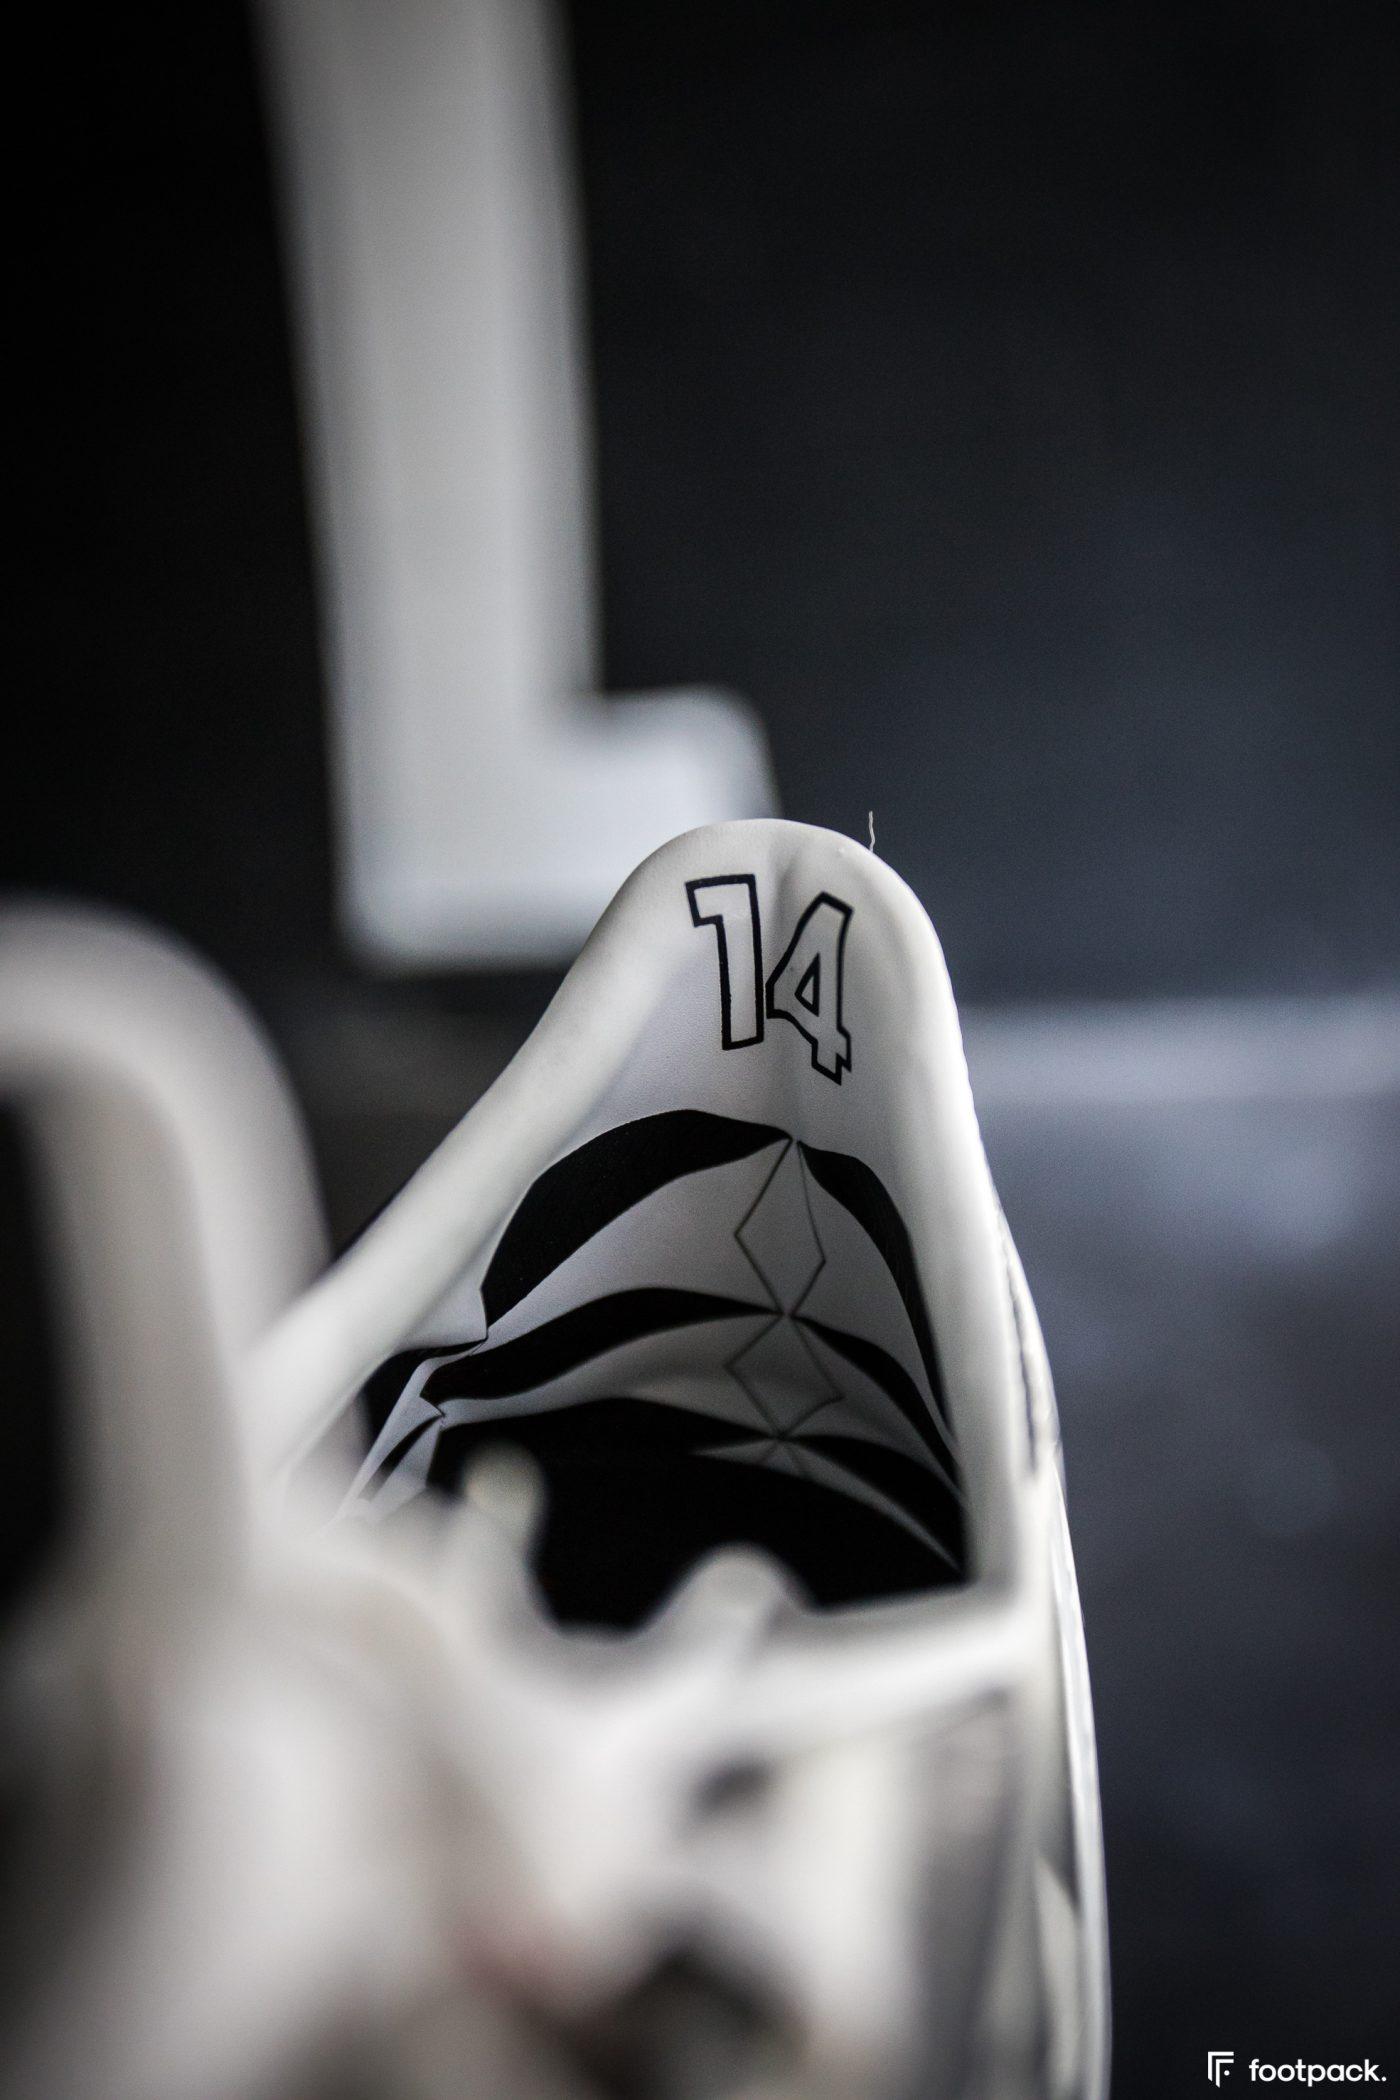 adidas-F50-adizero-battle-pack-coupe-du-monde-2014-footpack-24